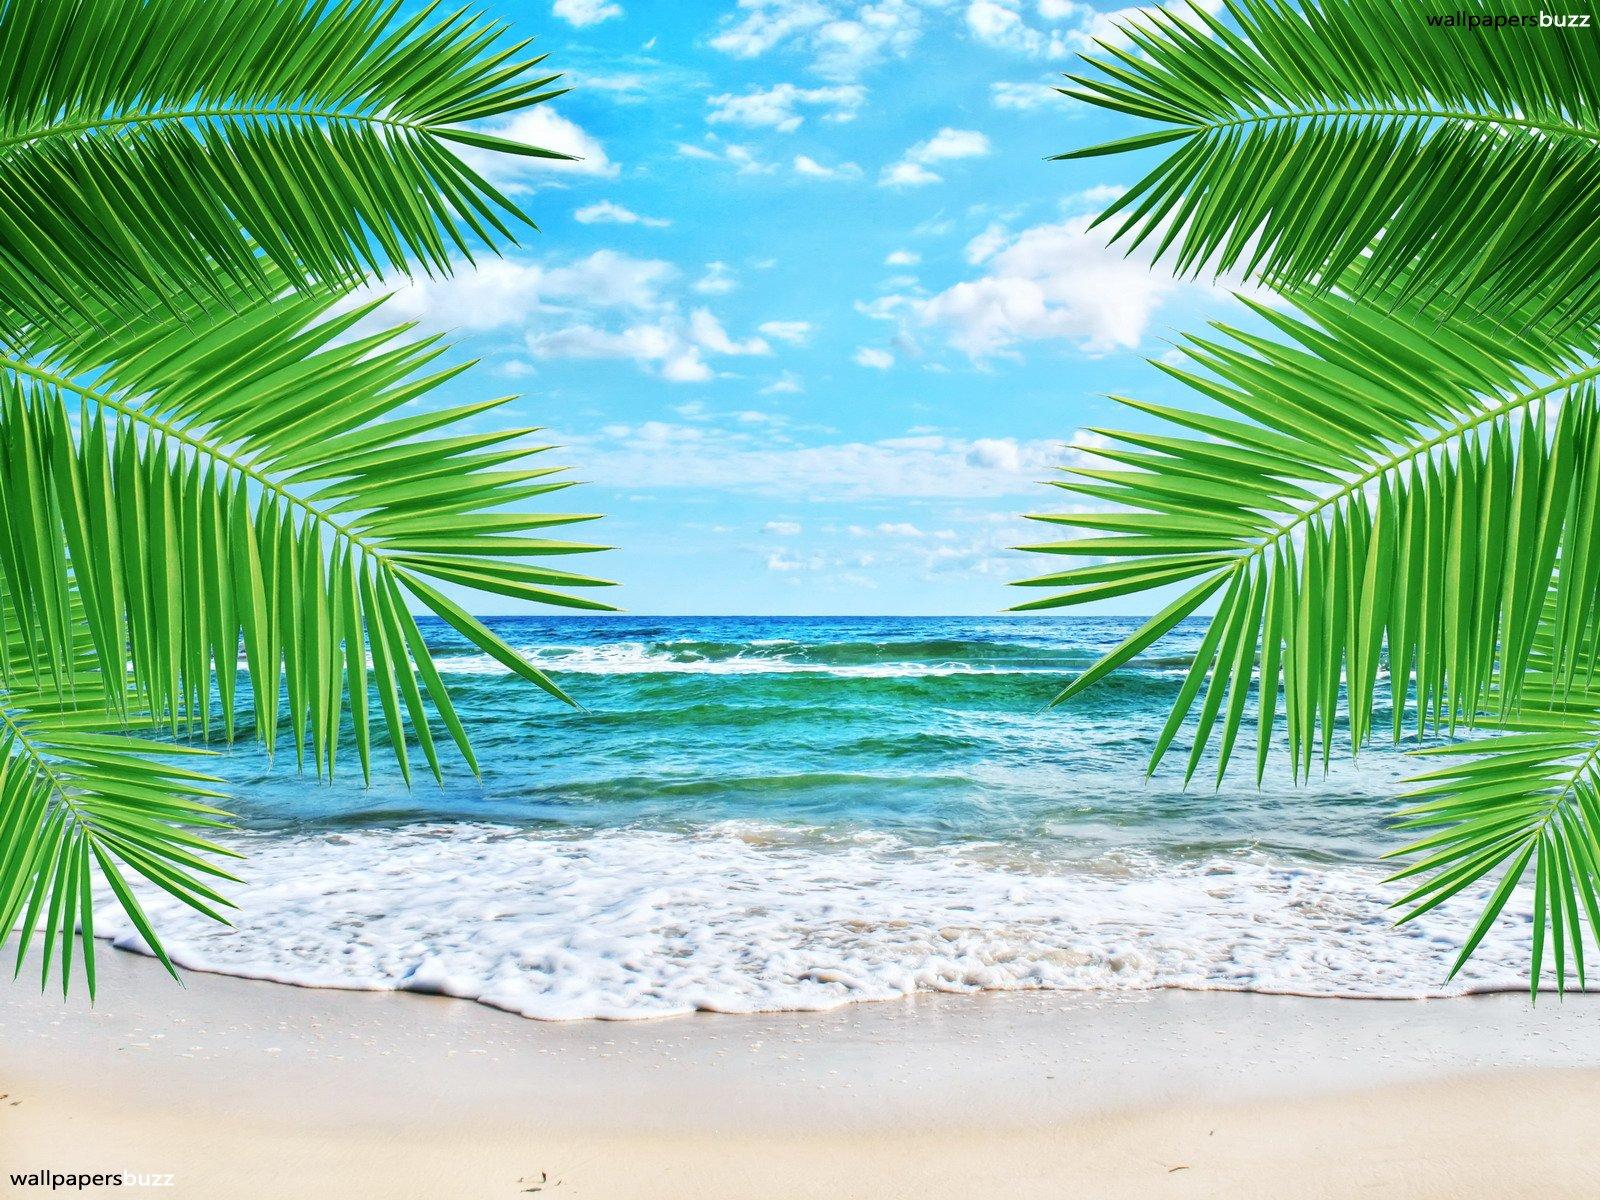 http://1.bp.blogspot.com/-LqOPKolSXpw/UHZ8gS3-PdI/AAAAAAAAIk8/WEw-jL22t10/s1600/beach-wallpaper-hd-33.jpg